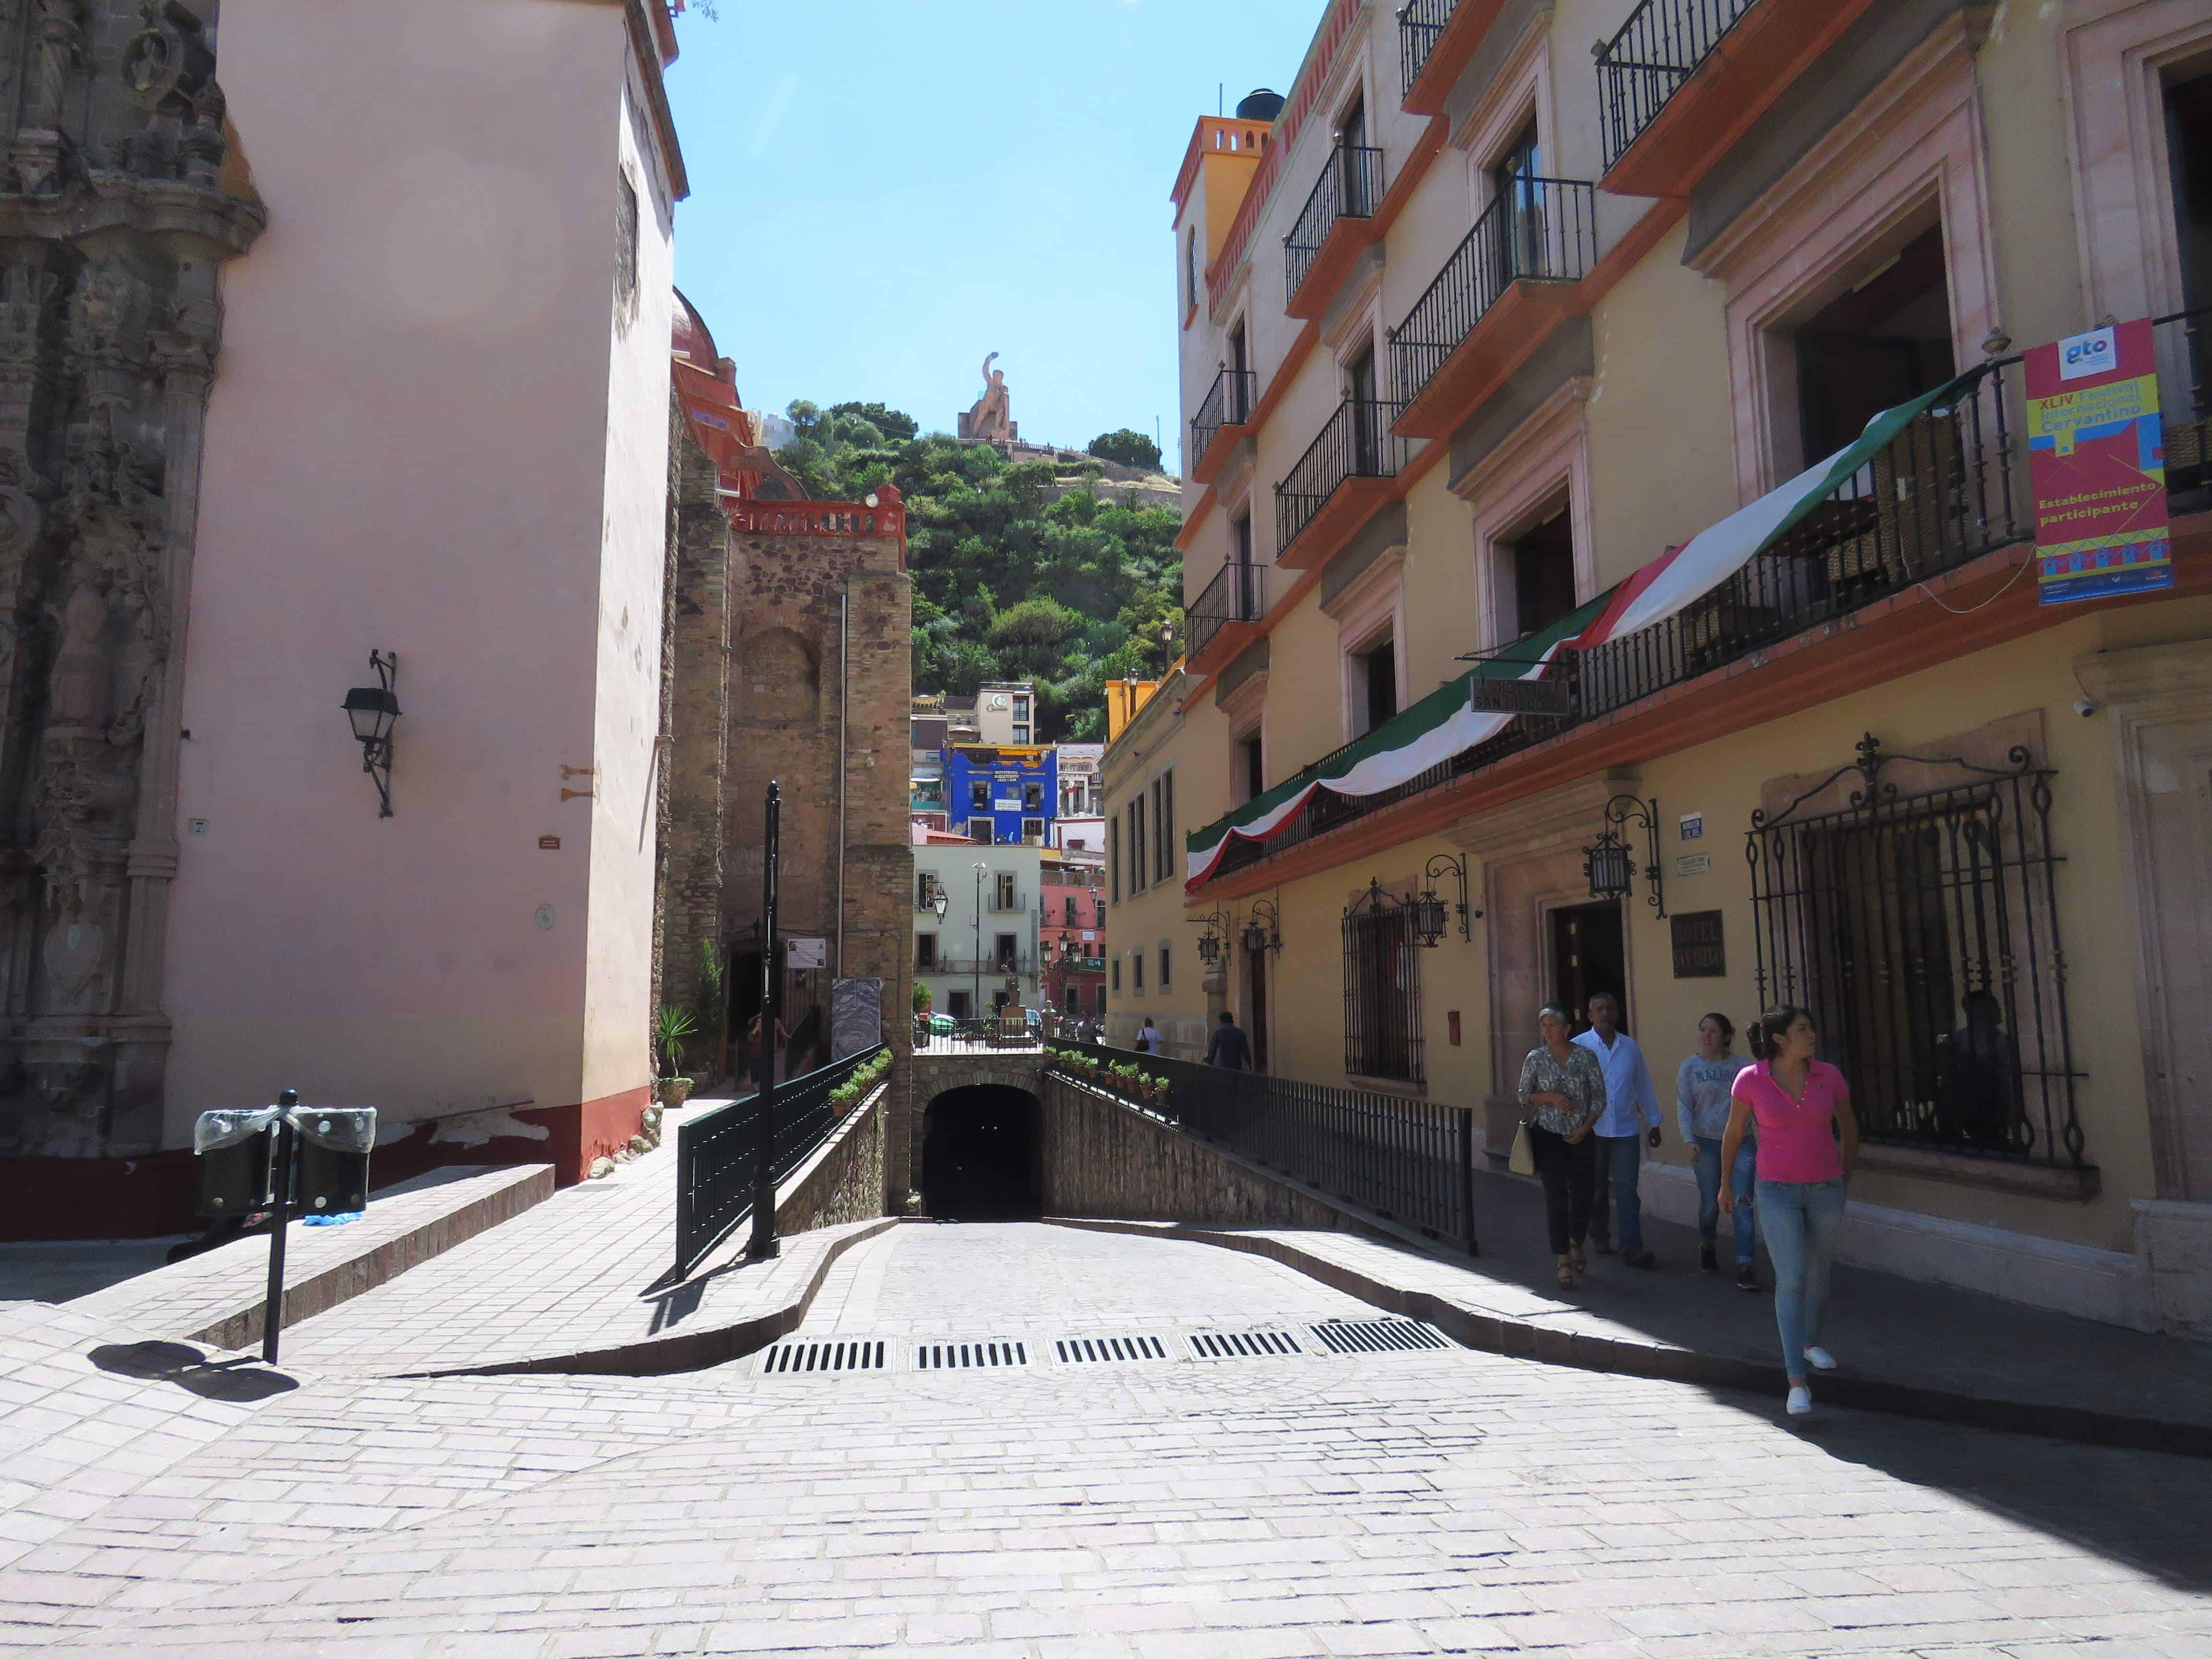 guanajuato- upper city, roads to the city below